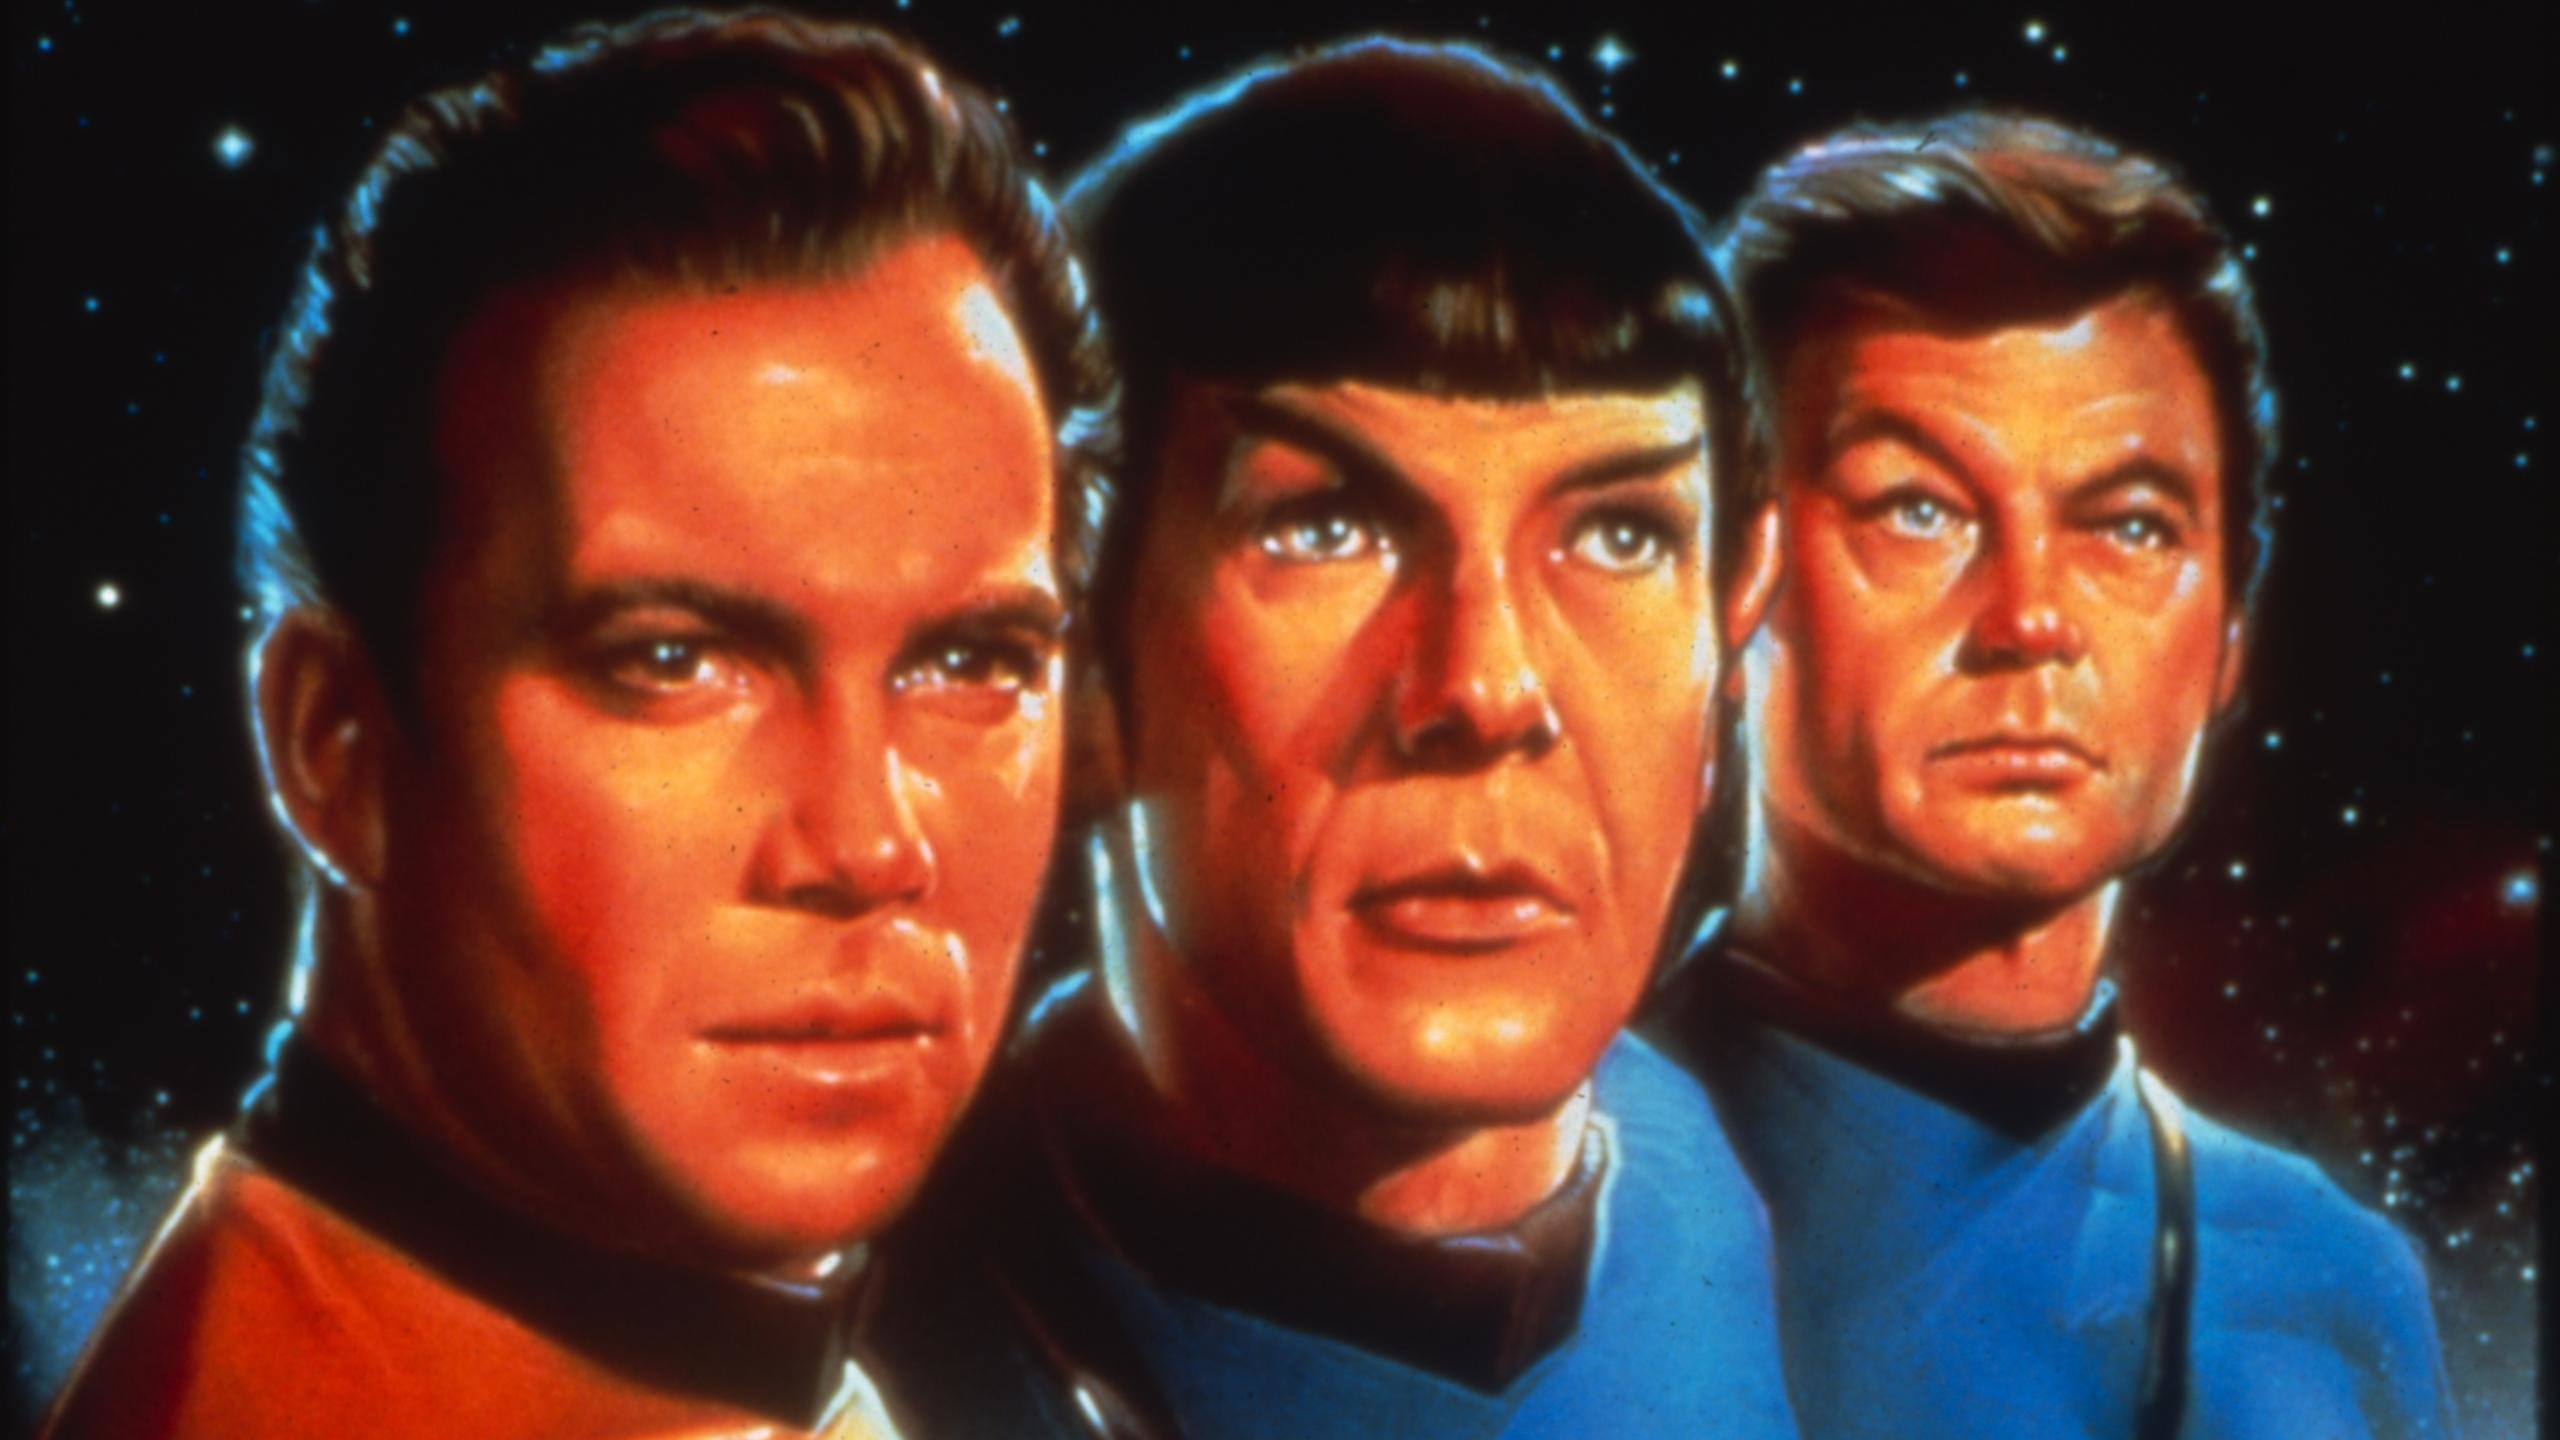 Star Trek The Original Series Wallpapers 2560x1440 Desktop